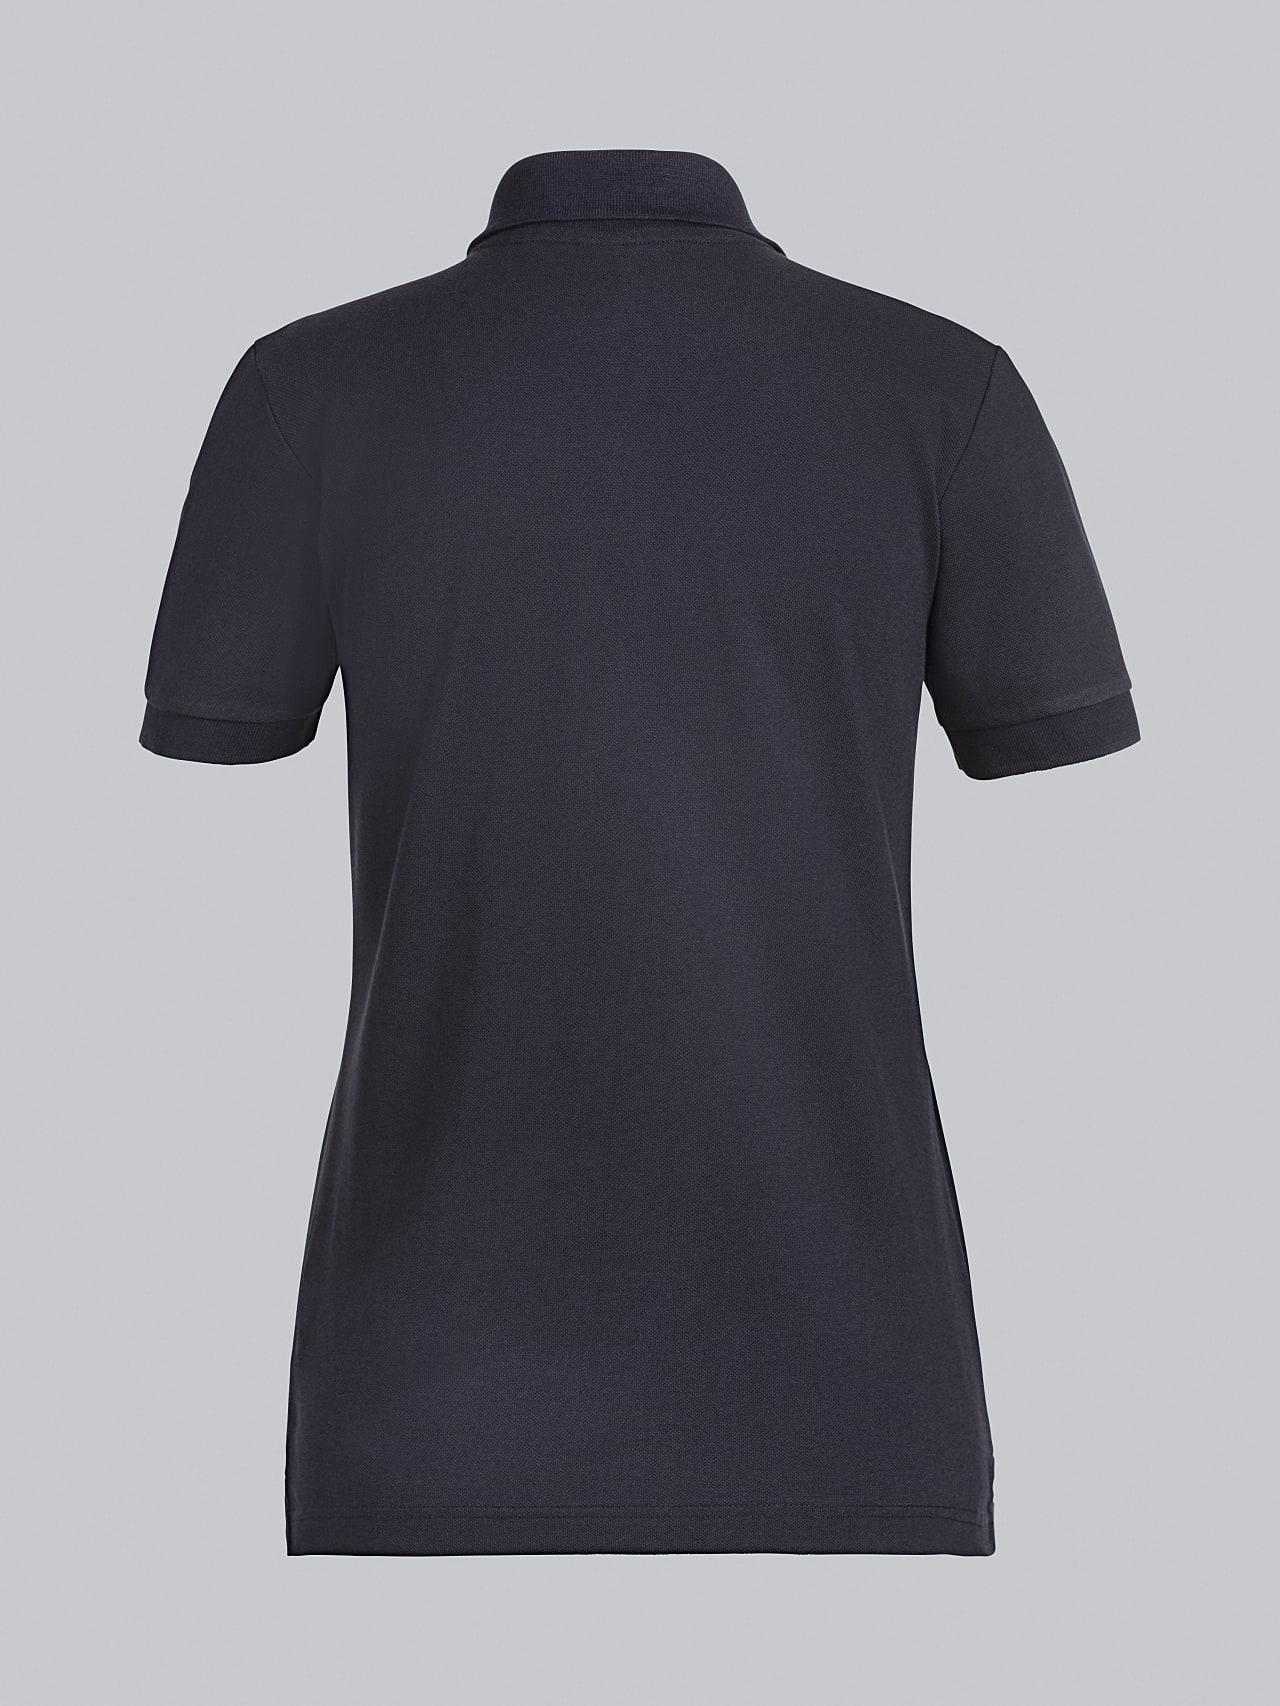 JANEY V1.Y5.02 Piqué-Poloshirt Navy Links Alpha Tauri